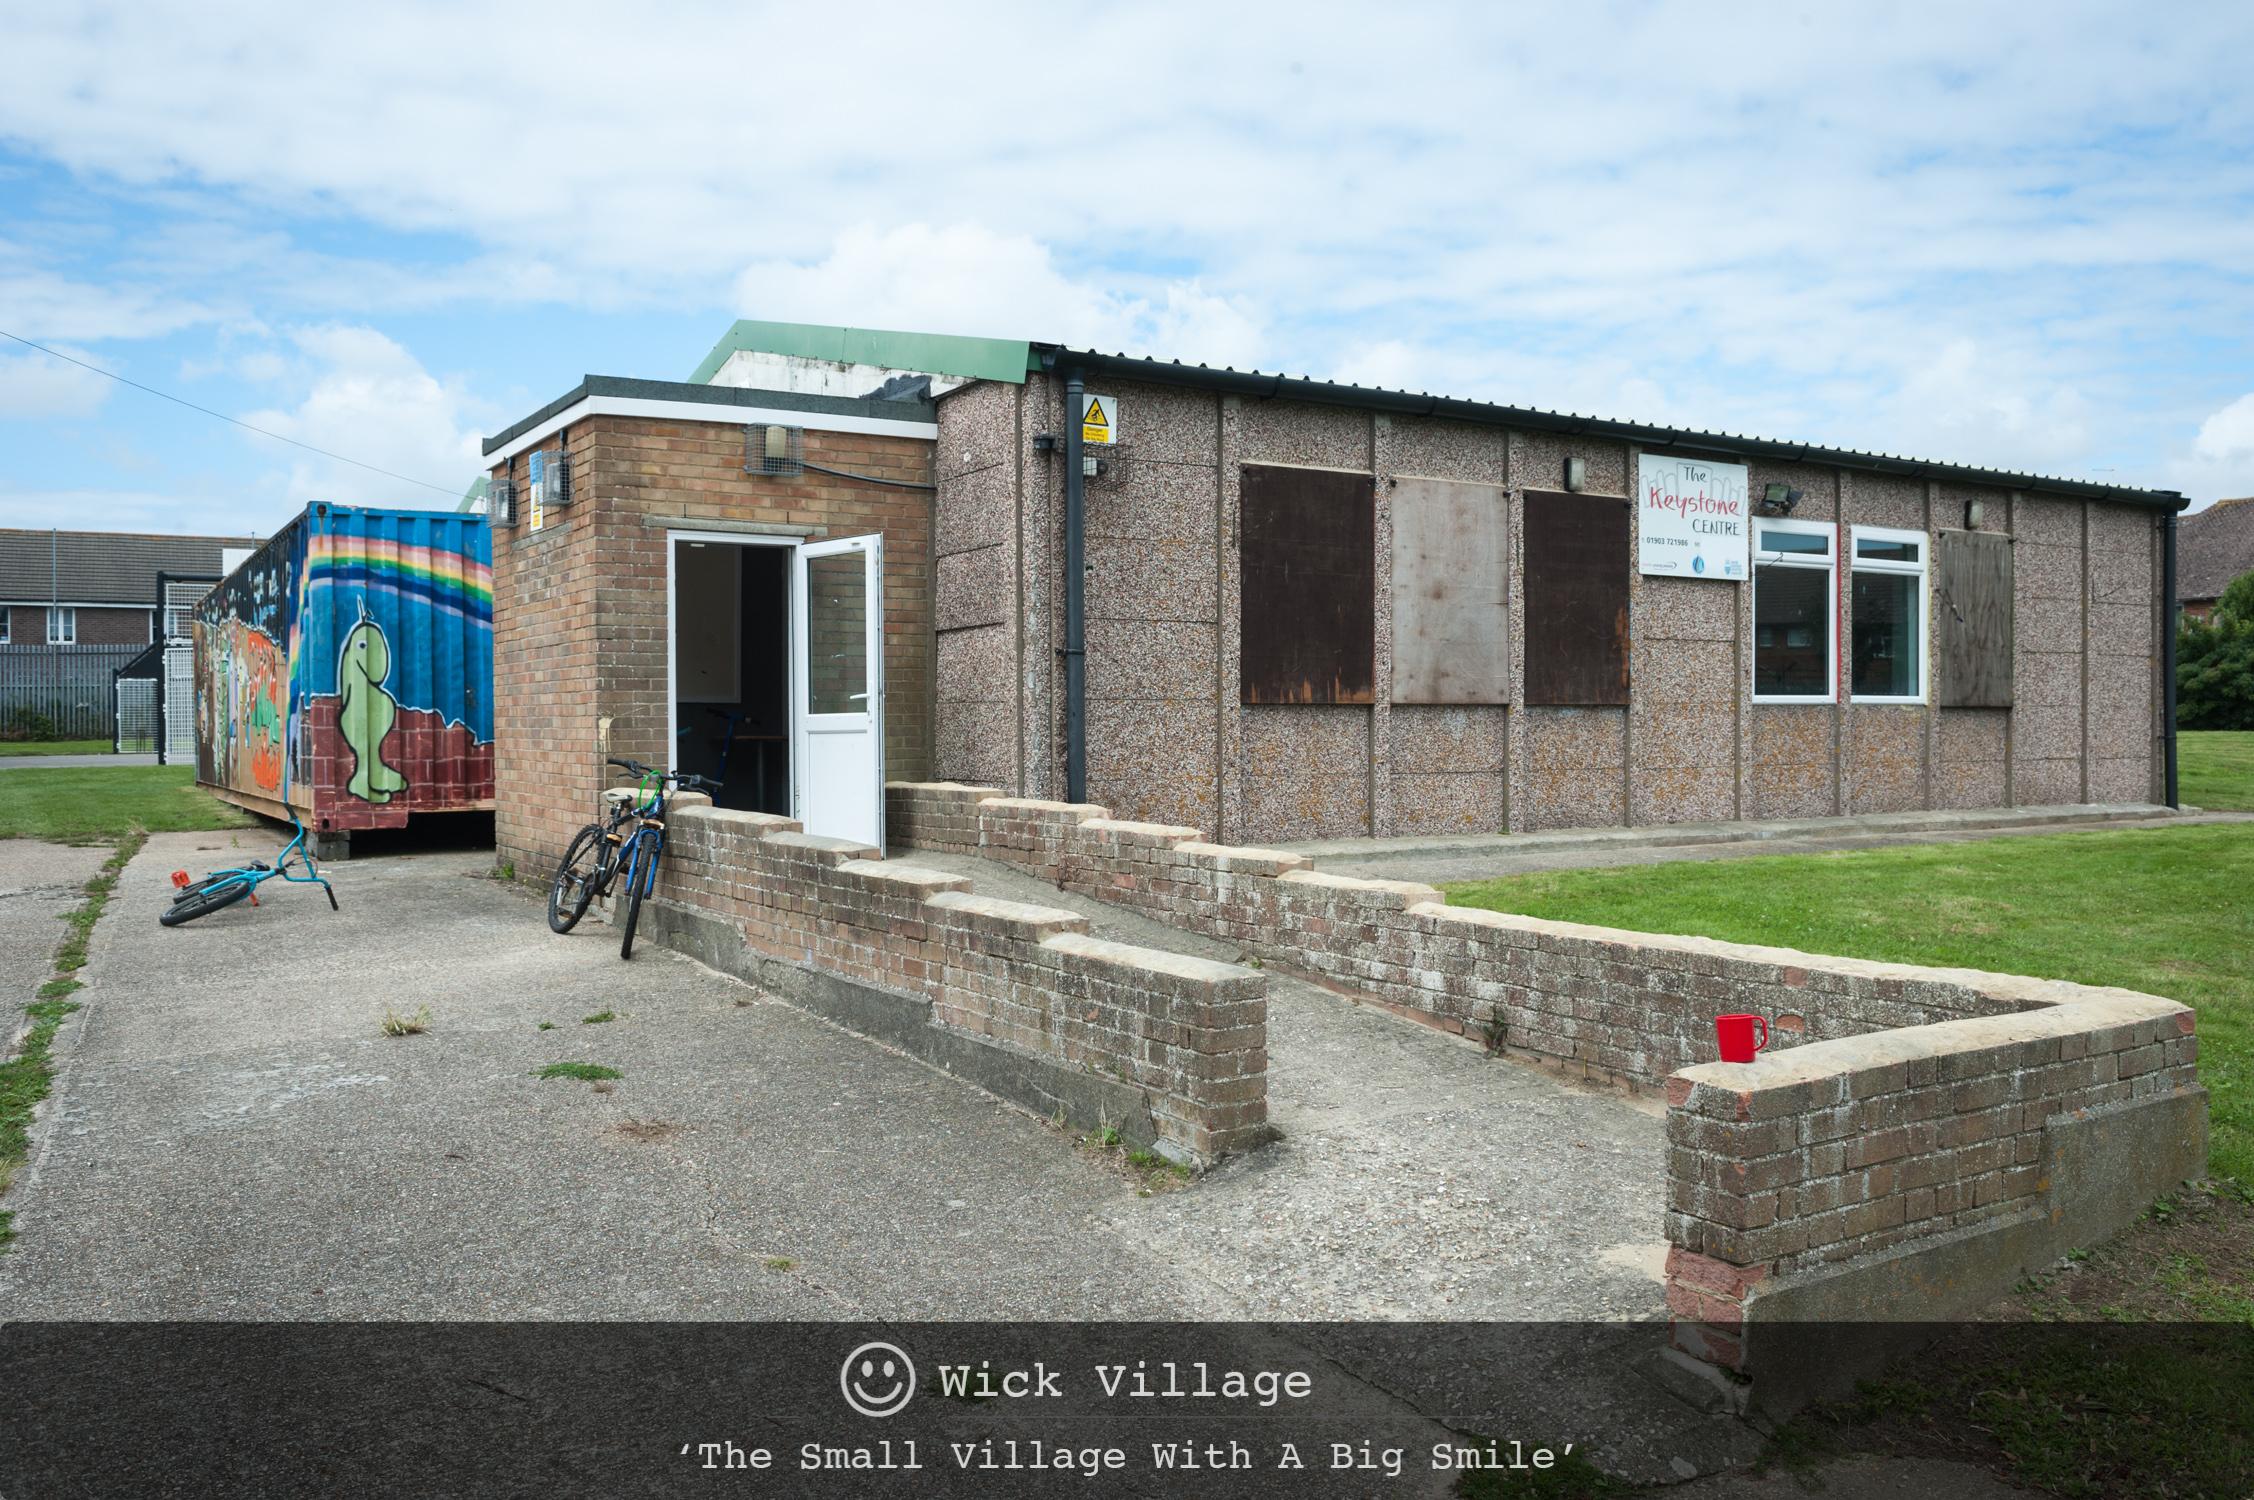 The Keystone Centre, Wick Village, Littlehampton.